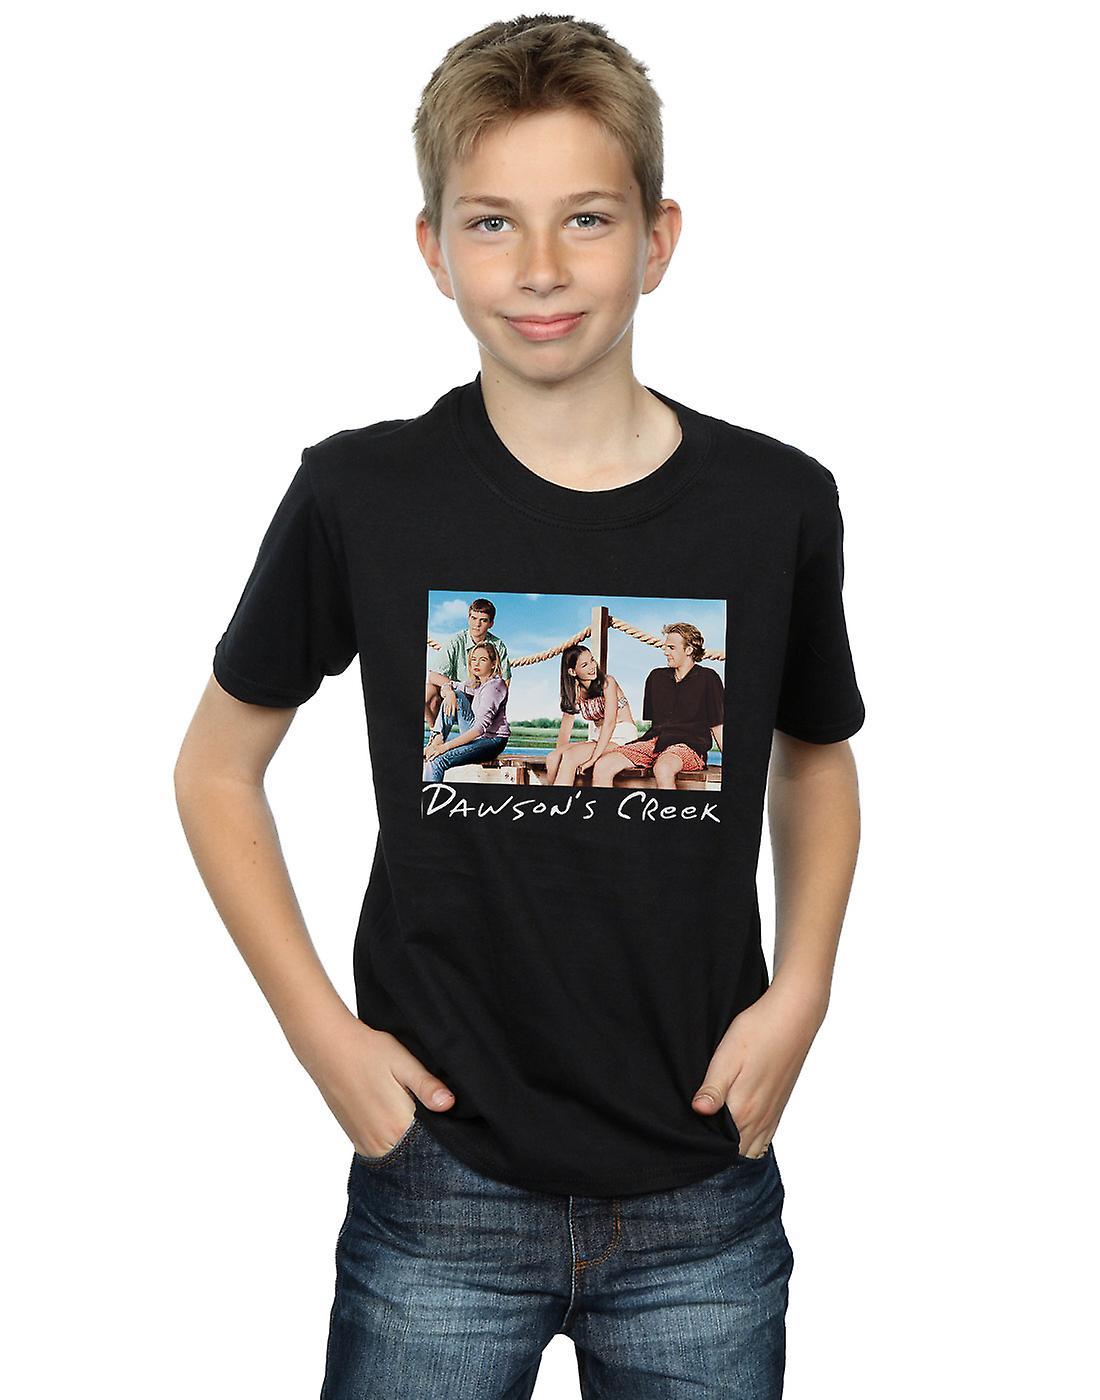 Dawson's Creek Boys Bridge Photo T-Shirt